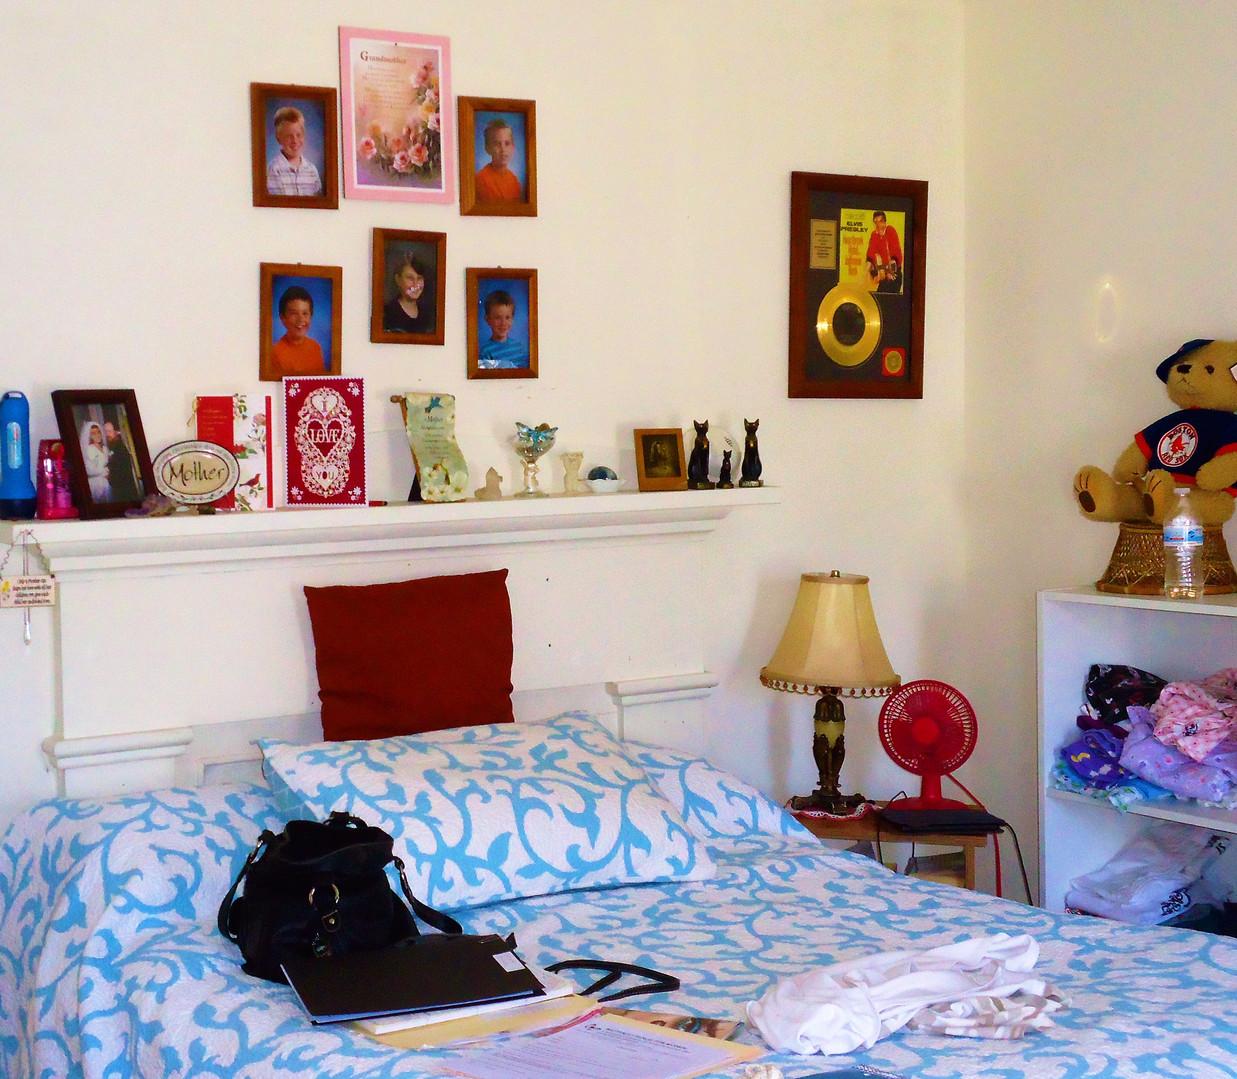 decoratedroom.jpg